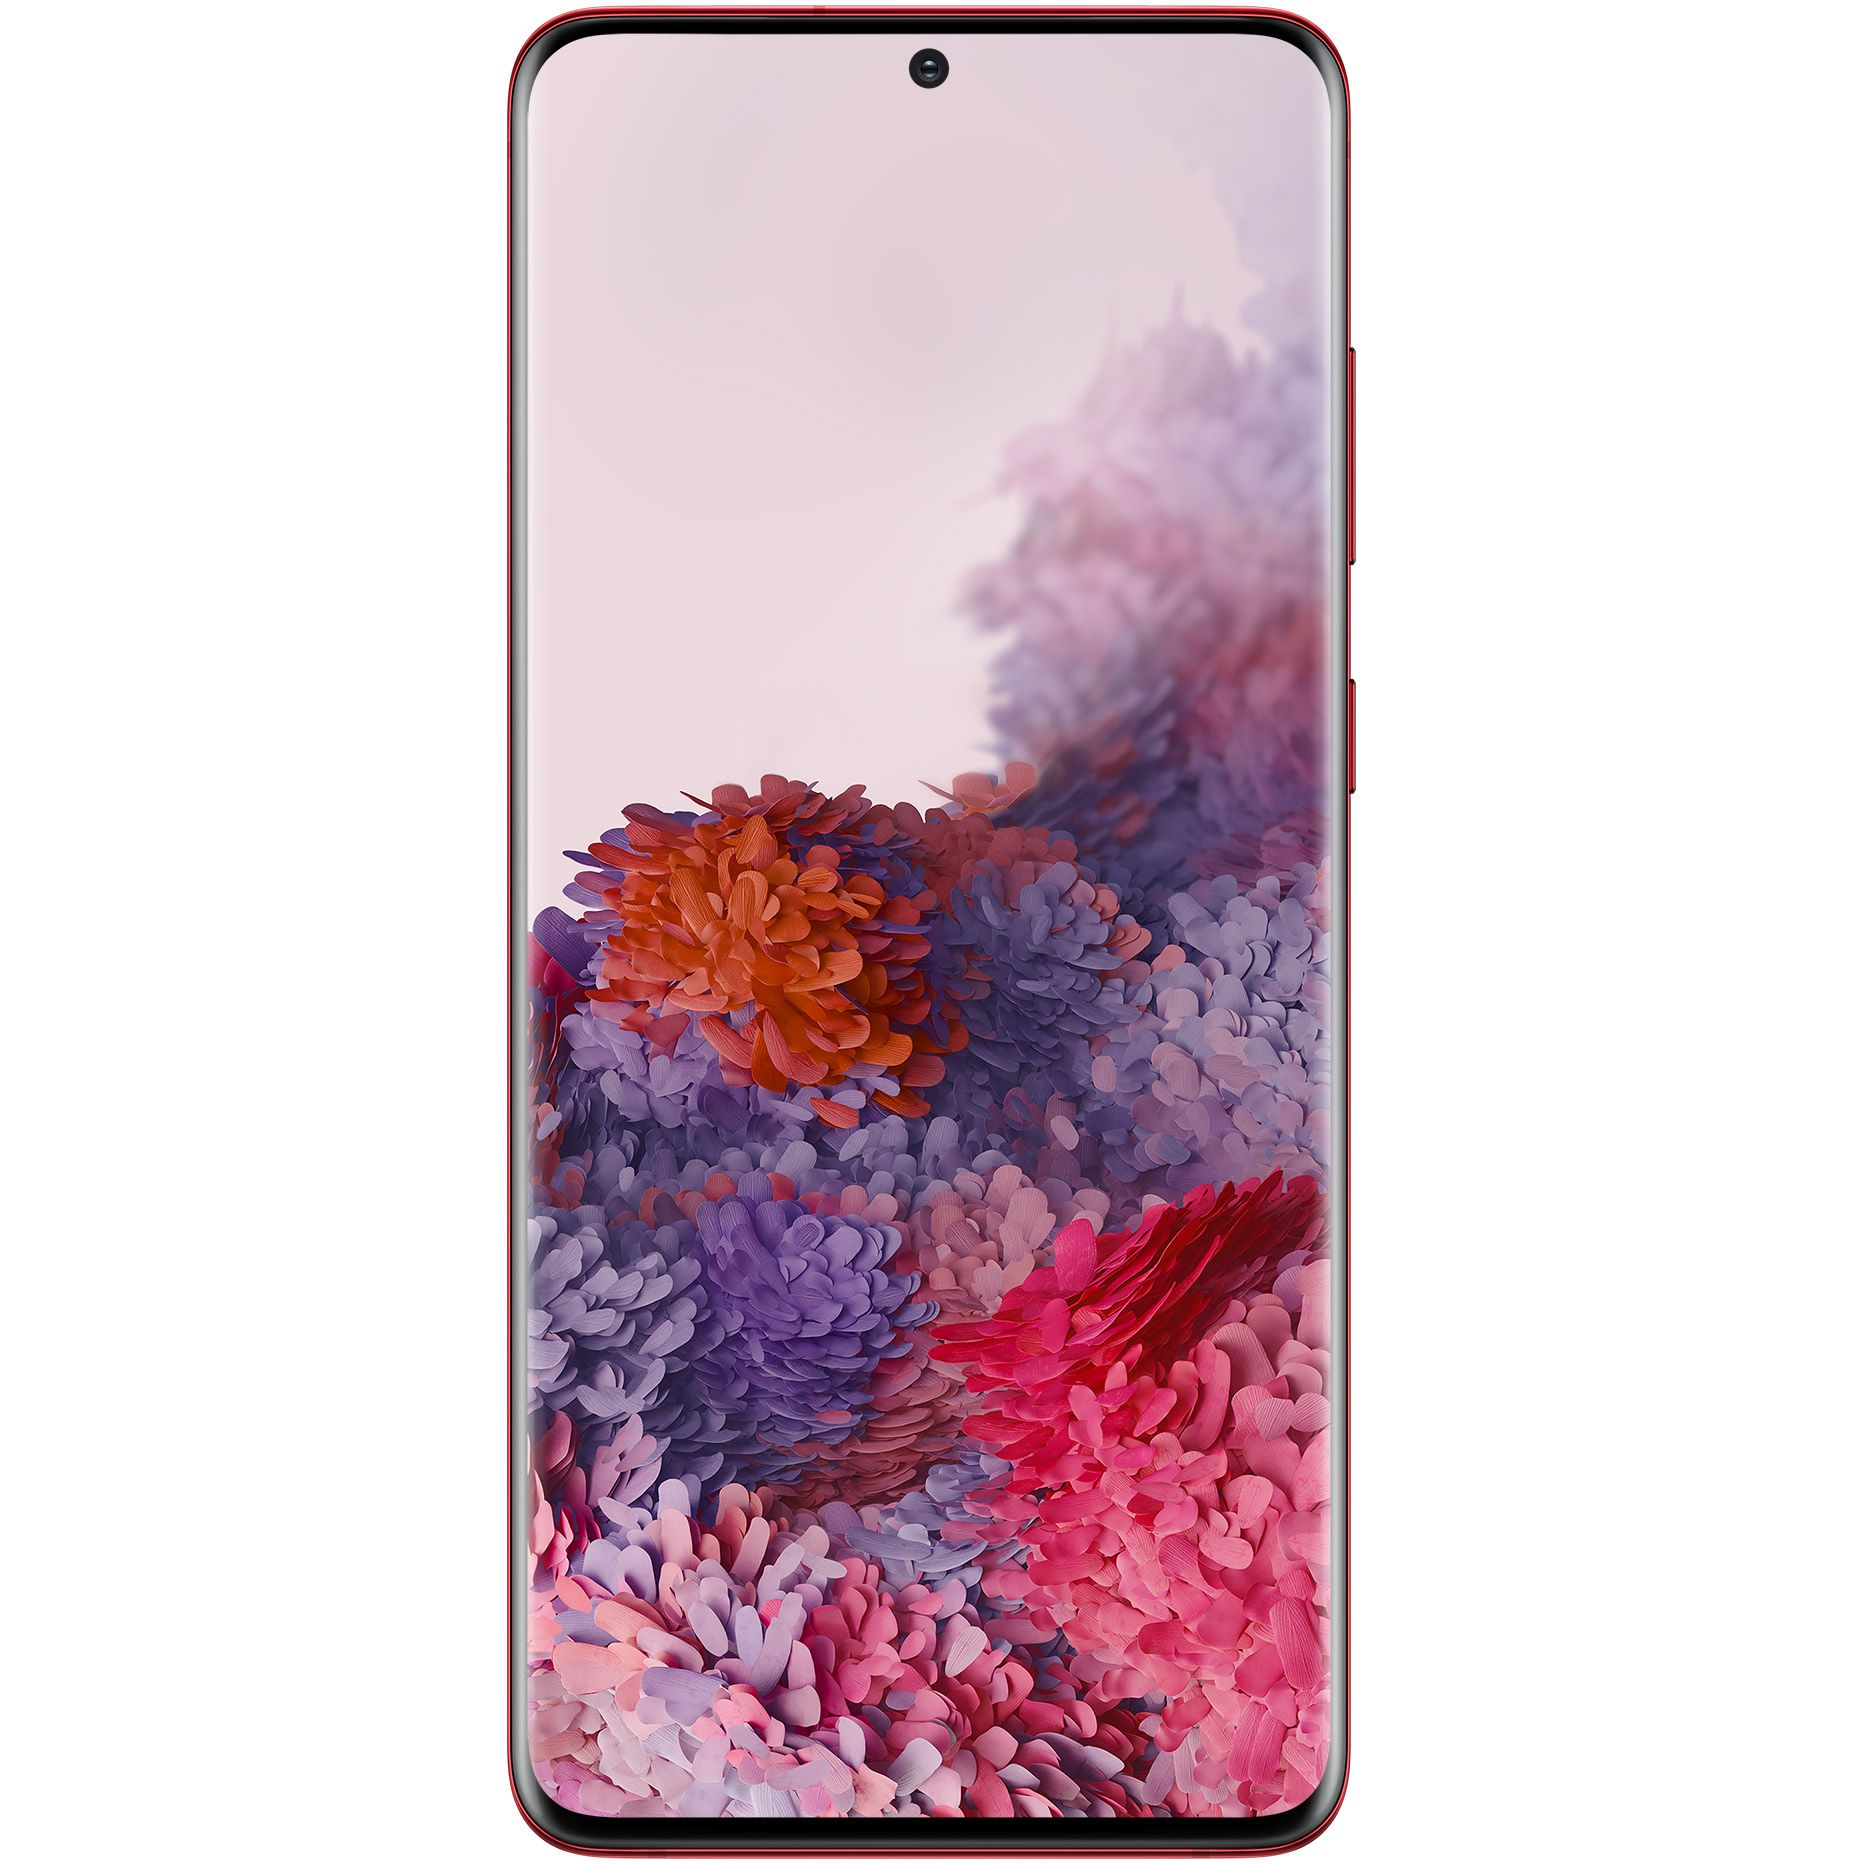 Telefon Mobil Samsung Galaxy S20 Plus G985 128GB Flash 8GB RAM Dual SIM 4G Aura Red